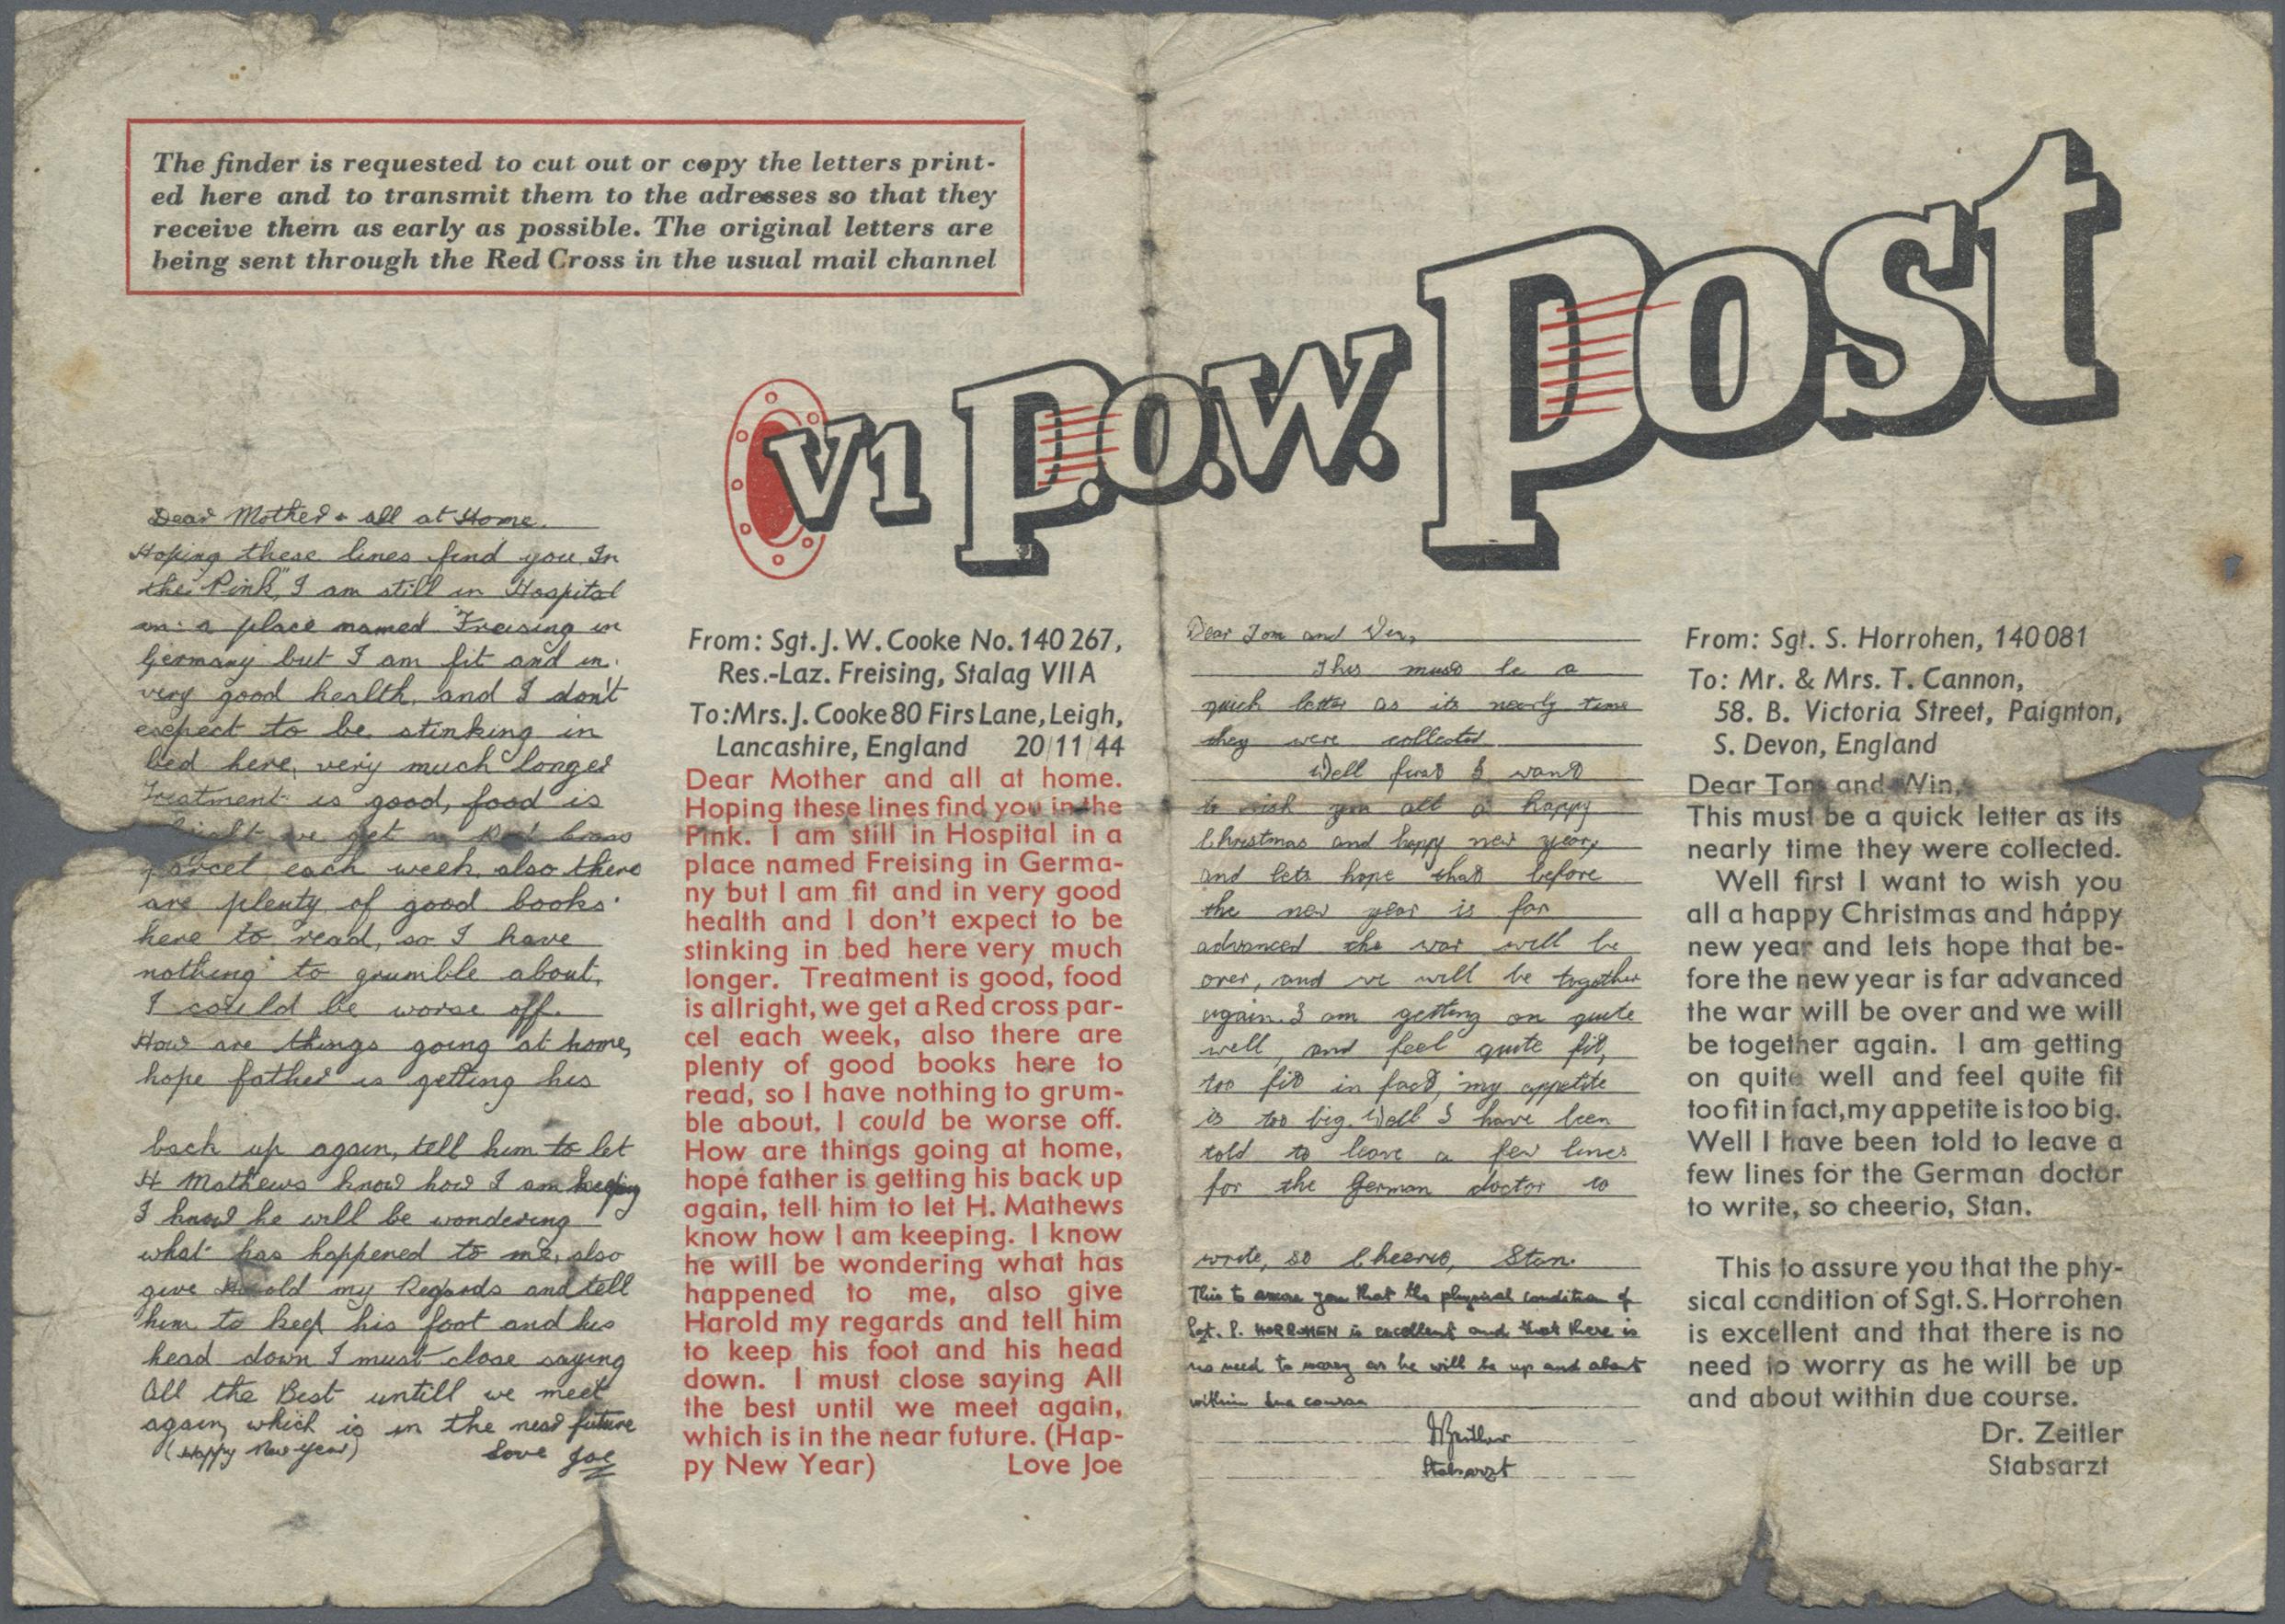 Stamp Auction - Ansichtskarten: Propaganda - Sale #43 Germany